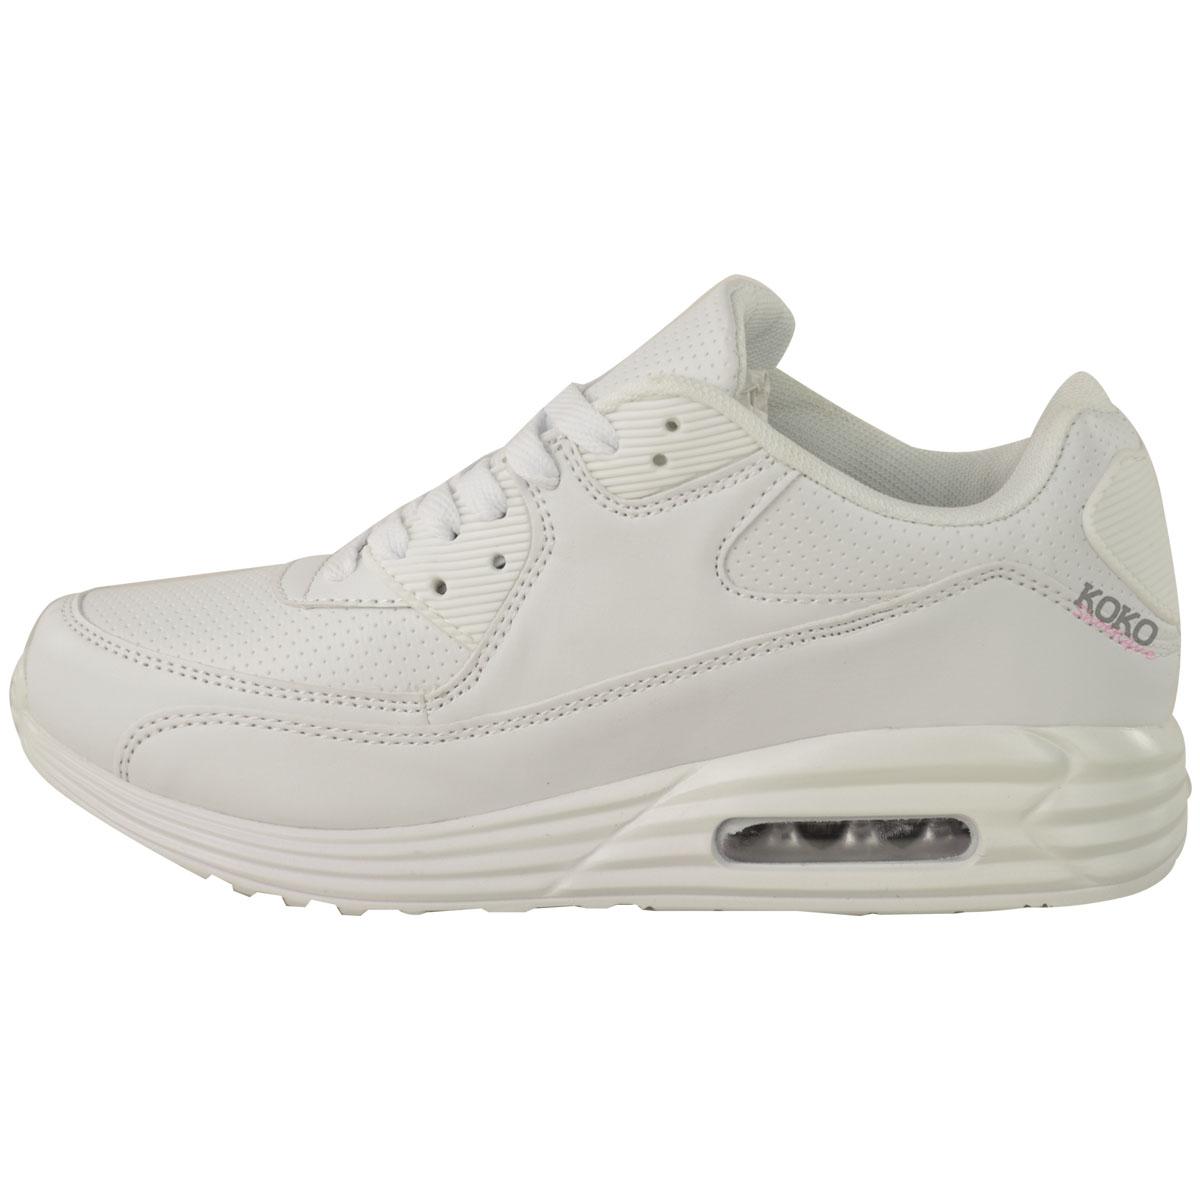 Shock Absorbing Running Shoes